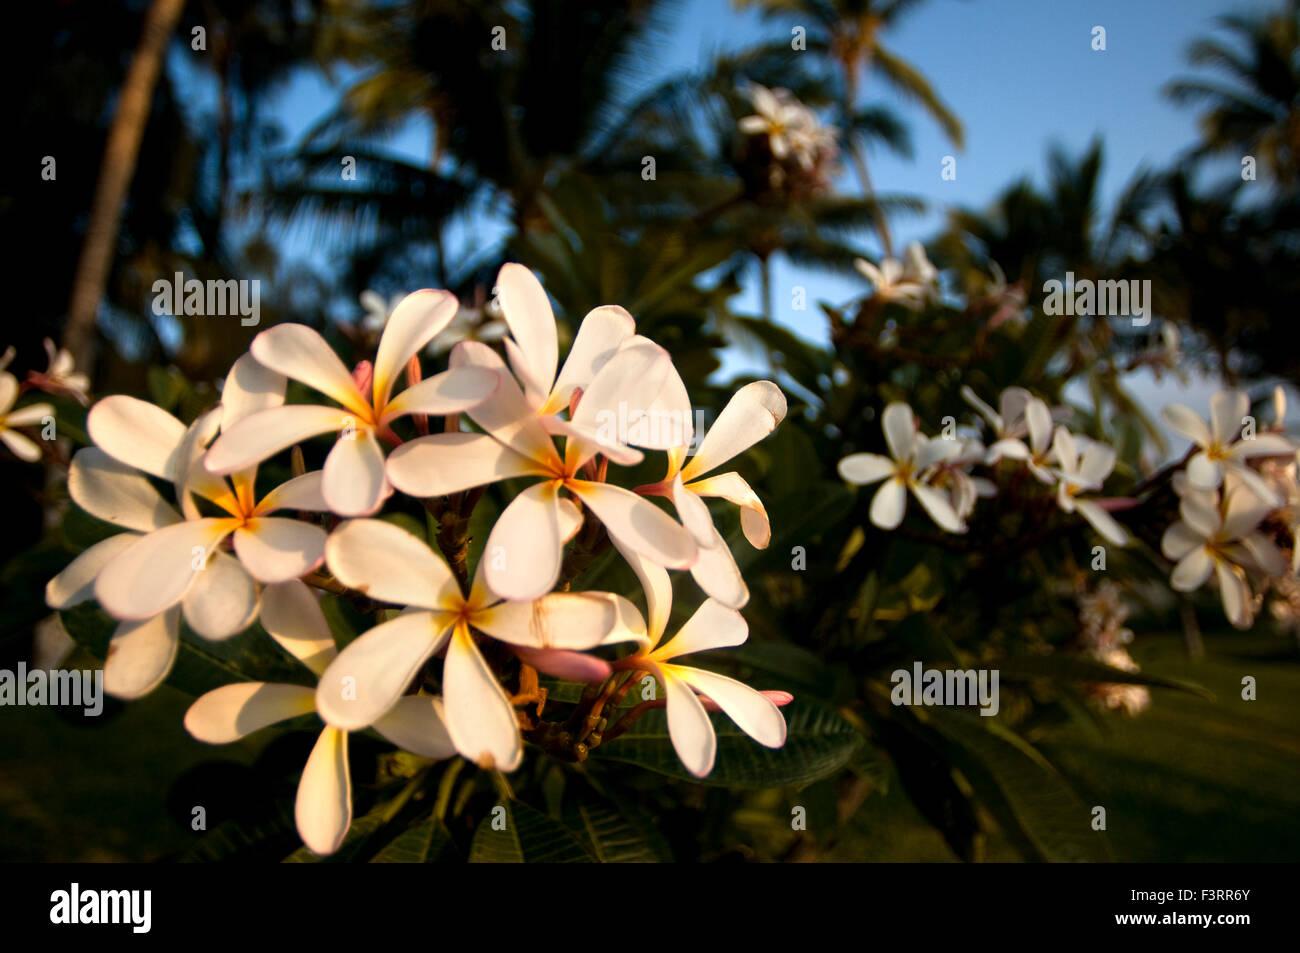 Hawaiian flower names gallery flower wallpaper hd hawaiian flower names plumeria images flower wallpaper hd hawaii flower names best flower 2017 hawaiian flower izmirmasajfo